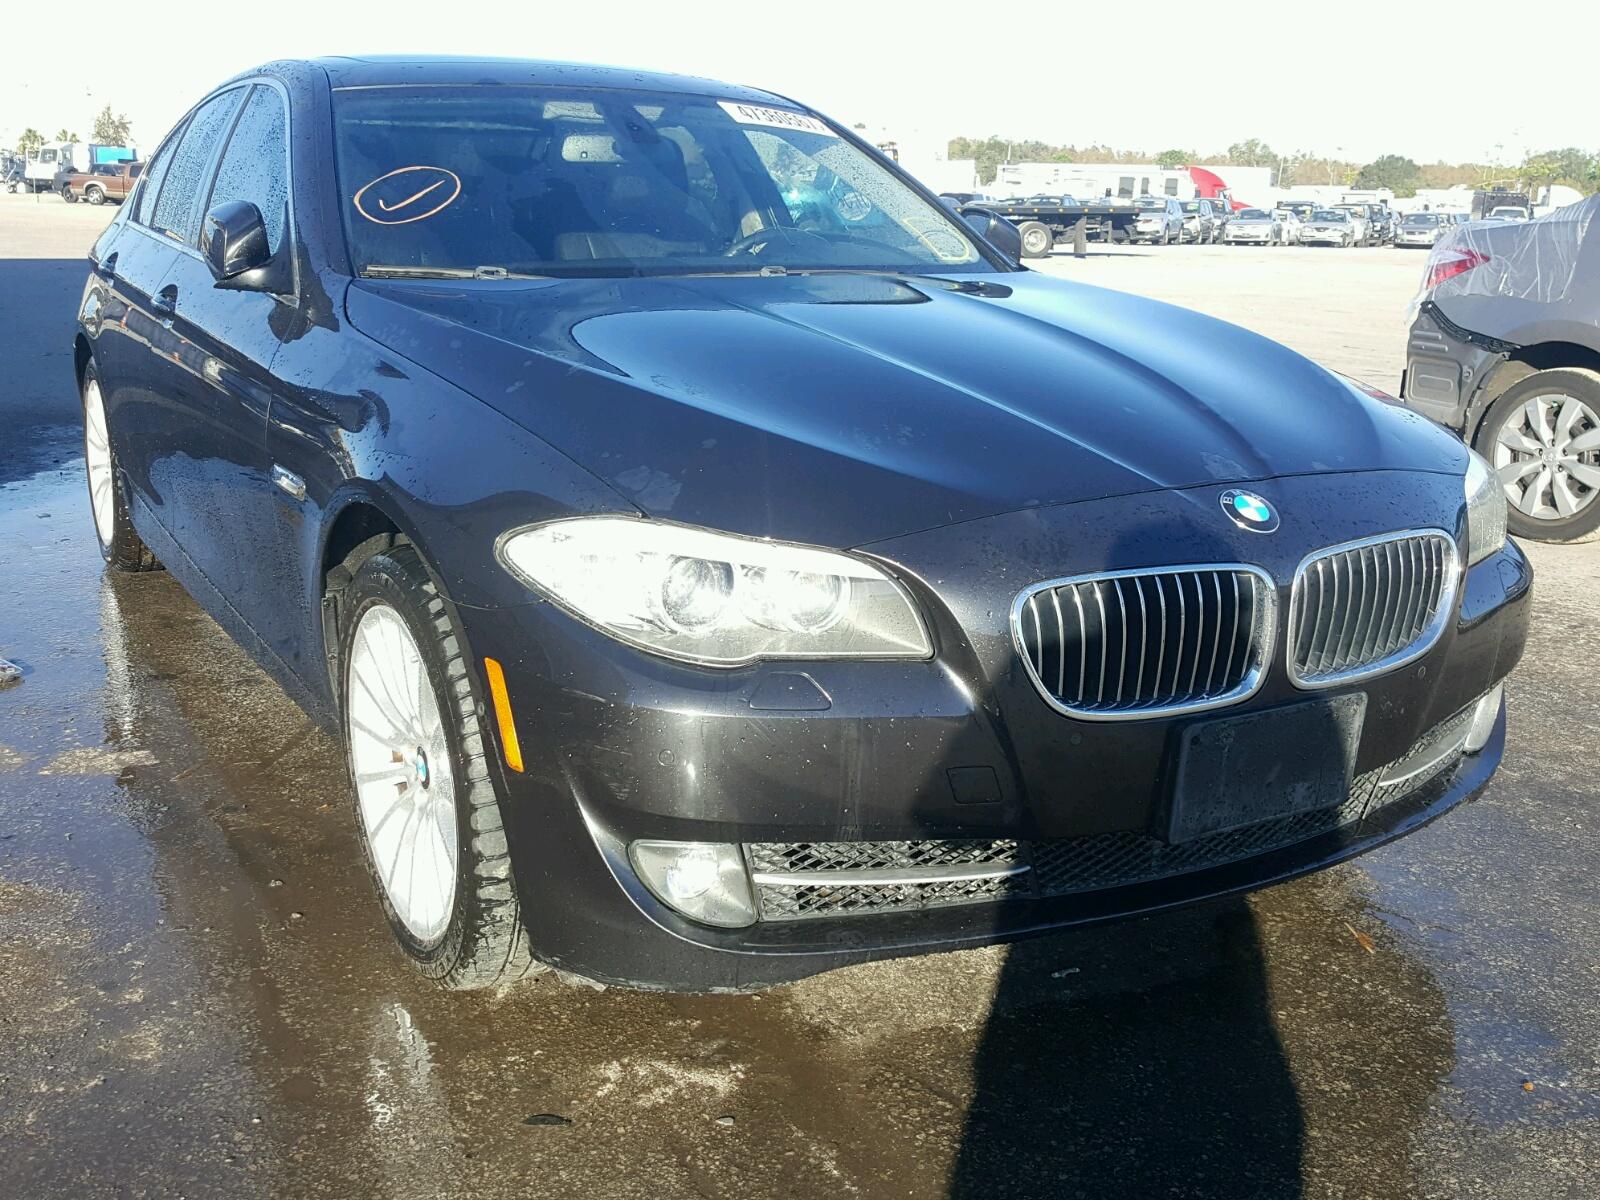 Auto Auction Ended On VIN WBAGNDS BMW LI In AZ - 2012 bmw 745li